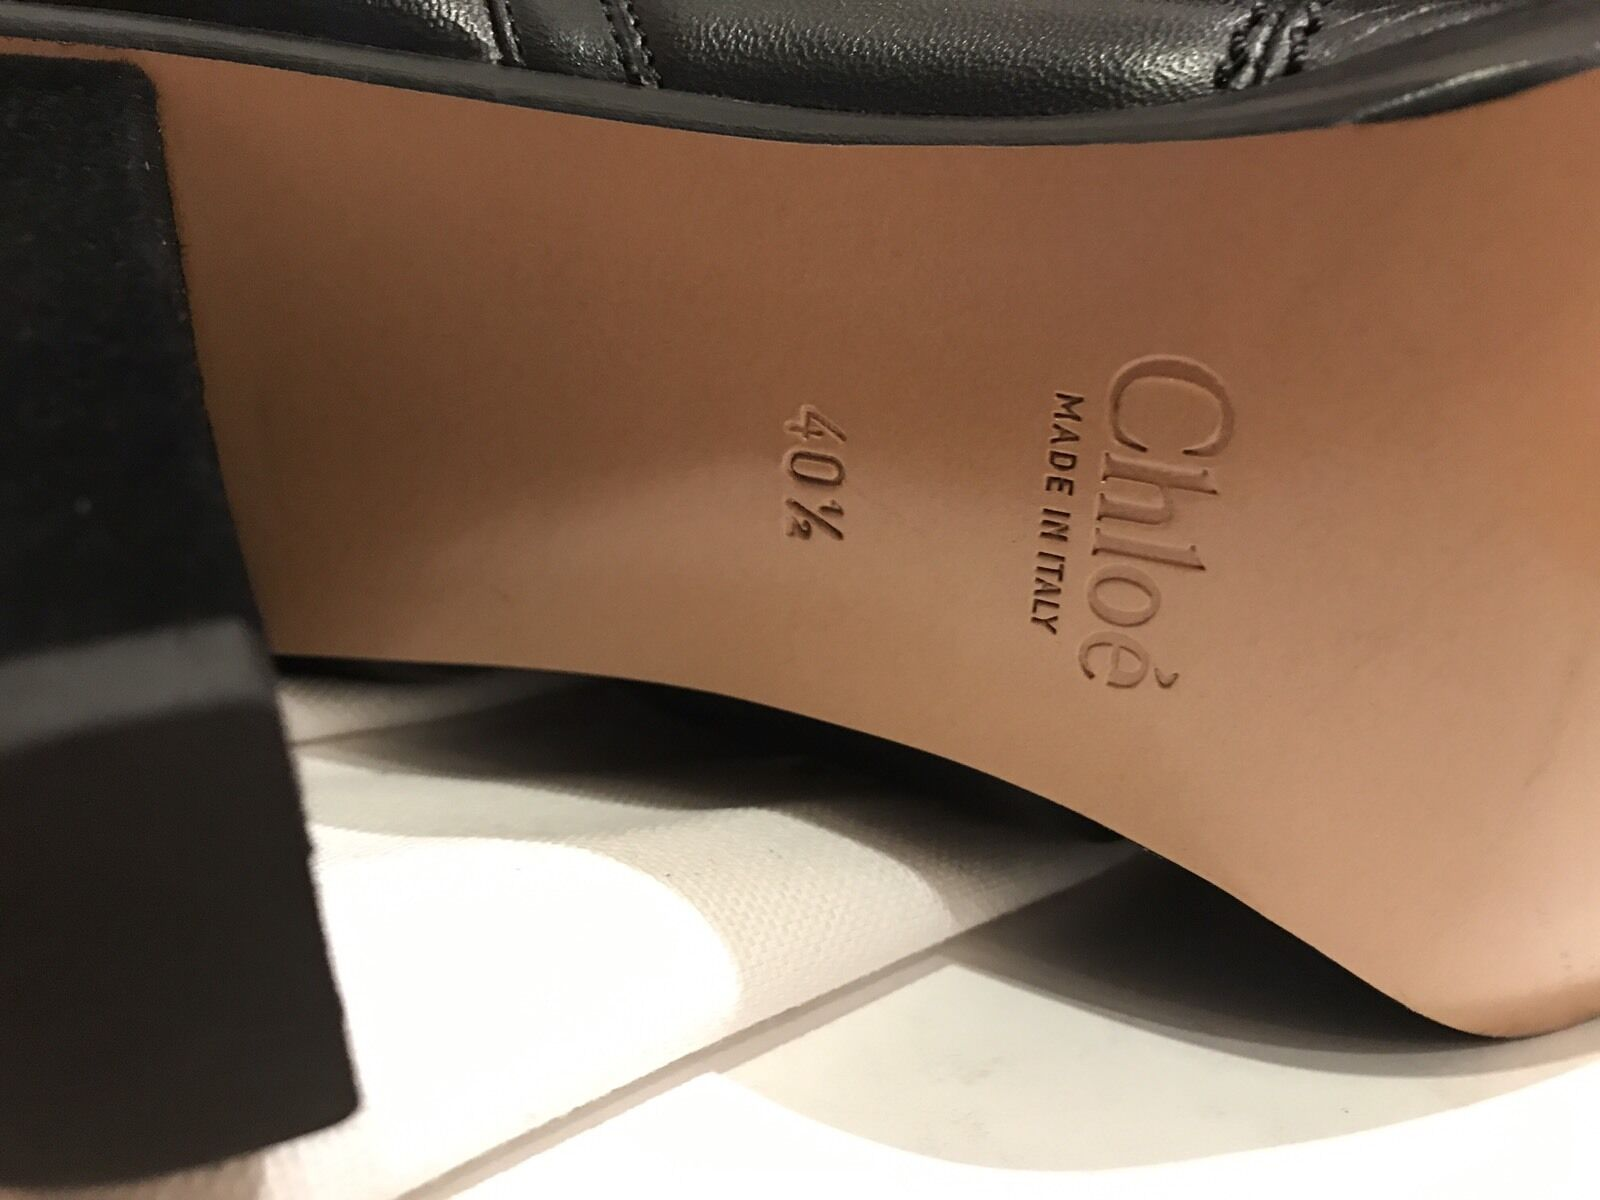 Chloe Acolchado Devon Cuero Negro Botas al Tobillo. BNWB. tamaño EU40.5. agotado!!!